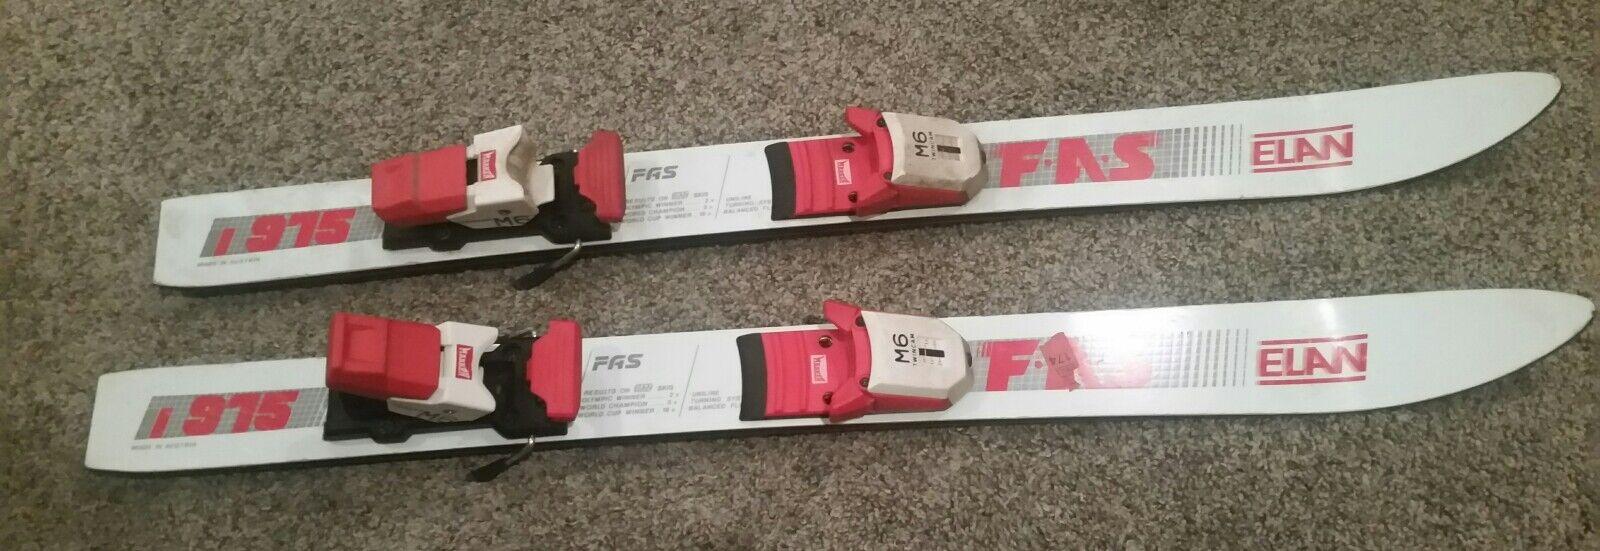 Elan FAS 975 White 89 cm Downhill Snow Skis  marker twin  cam m6 AdjBindings  buy discounts